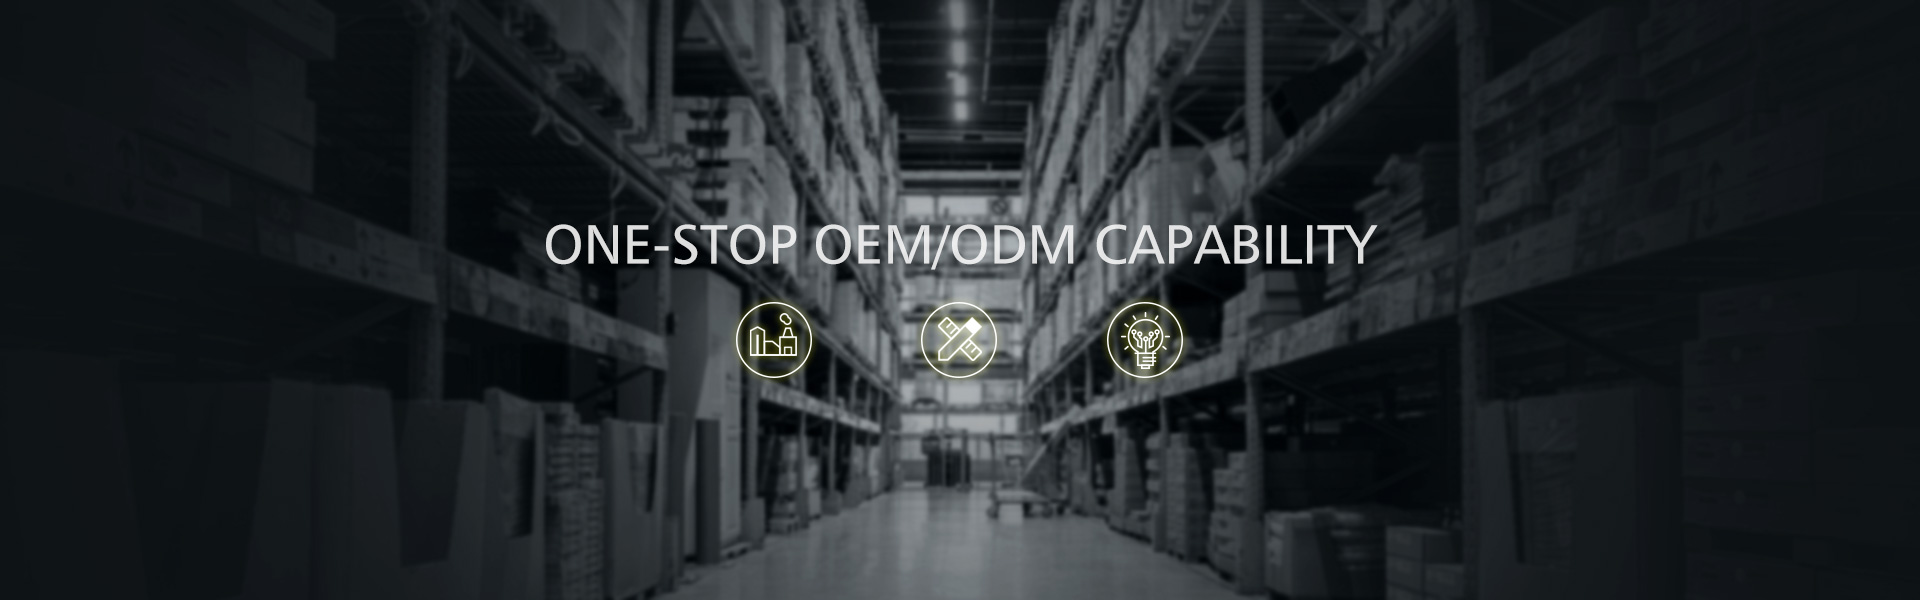 ONE-STOP OEM/ODM CAPABILITY